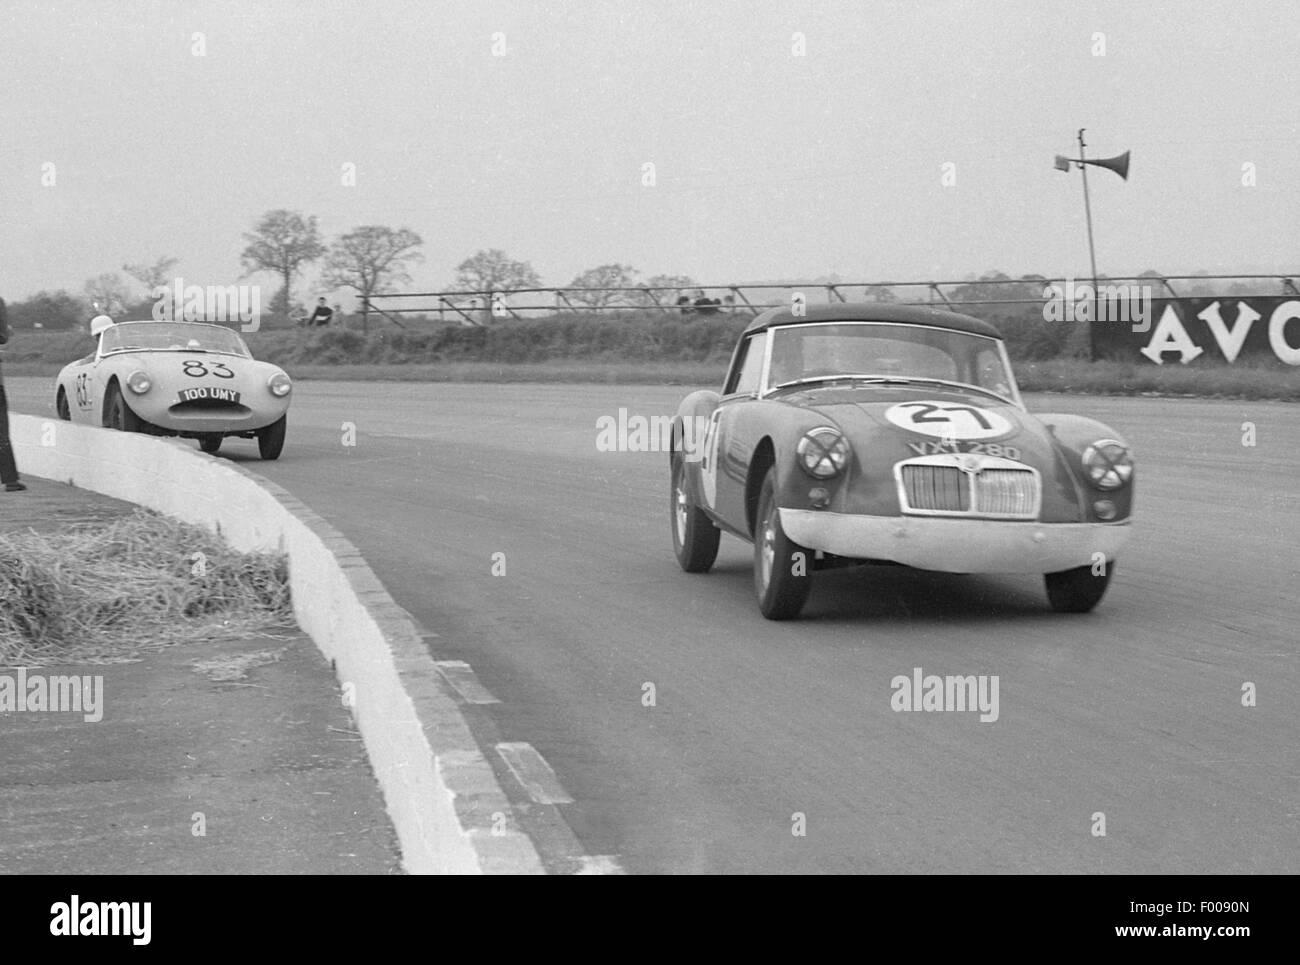 MGA Twin Cam Ecurie Chiltern. D.G. Dixon. Silverstone 9. Mai 1959 Stockbild